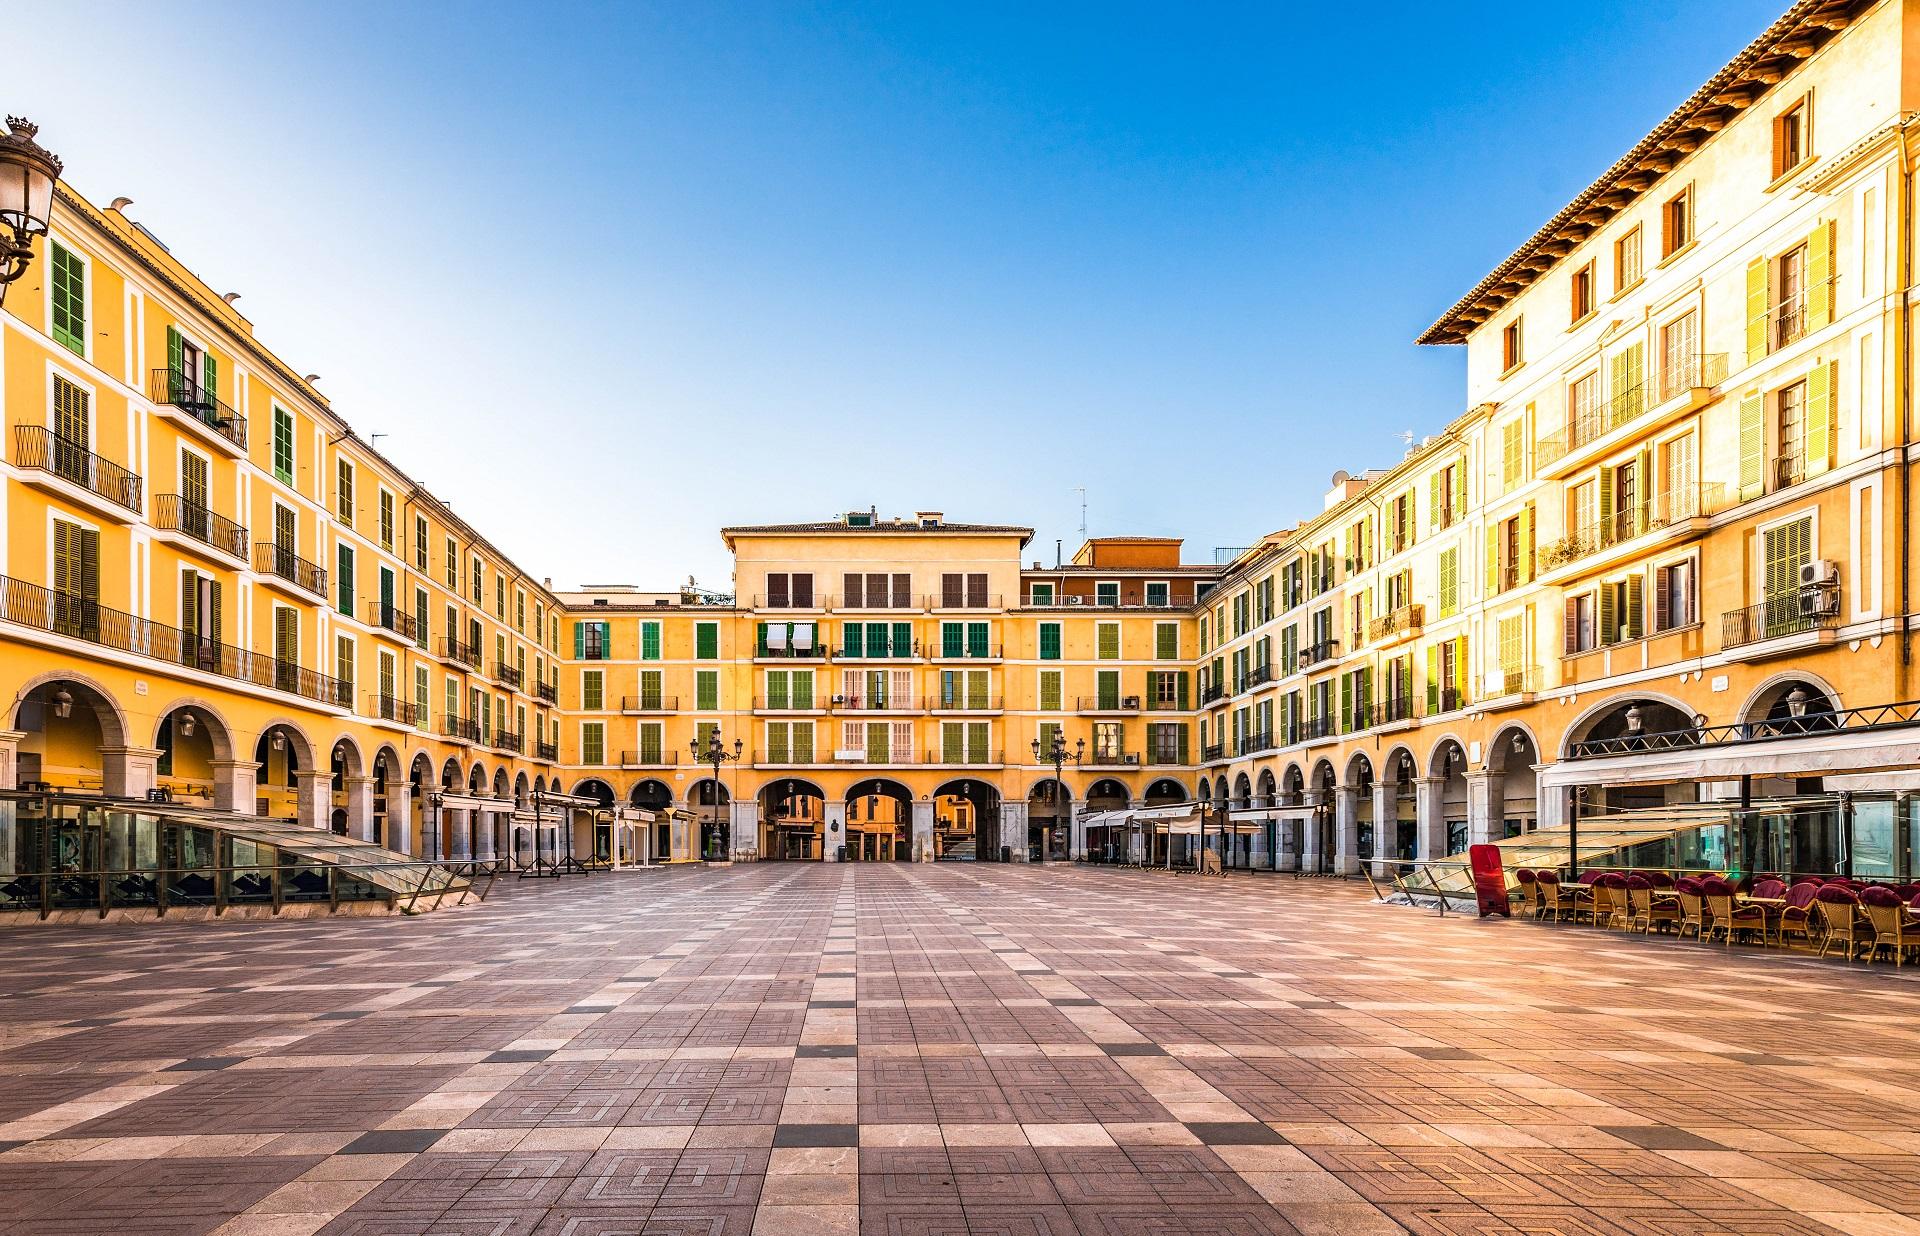 Der Plaza de Major in Palma de Mallorca an einem sonnigen Tag.